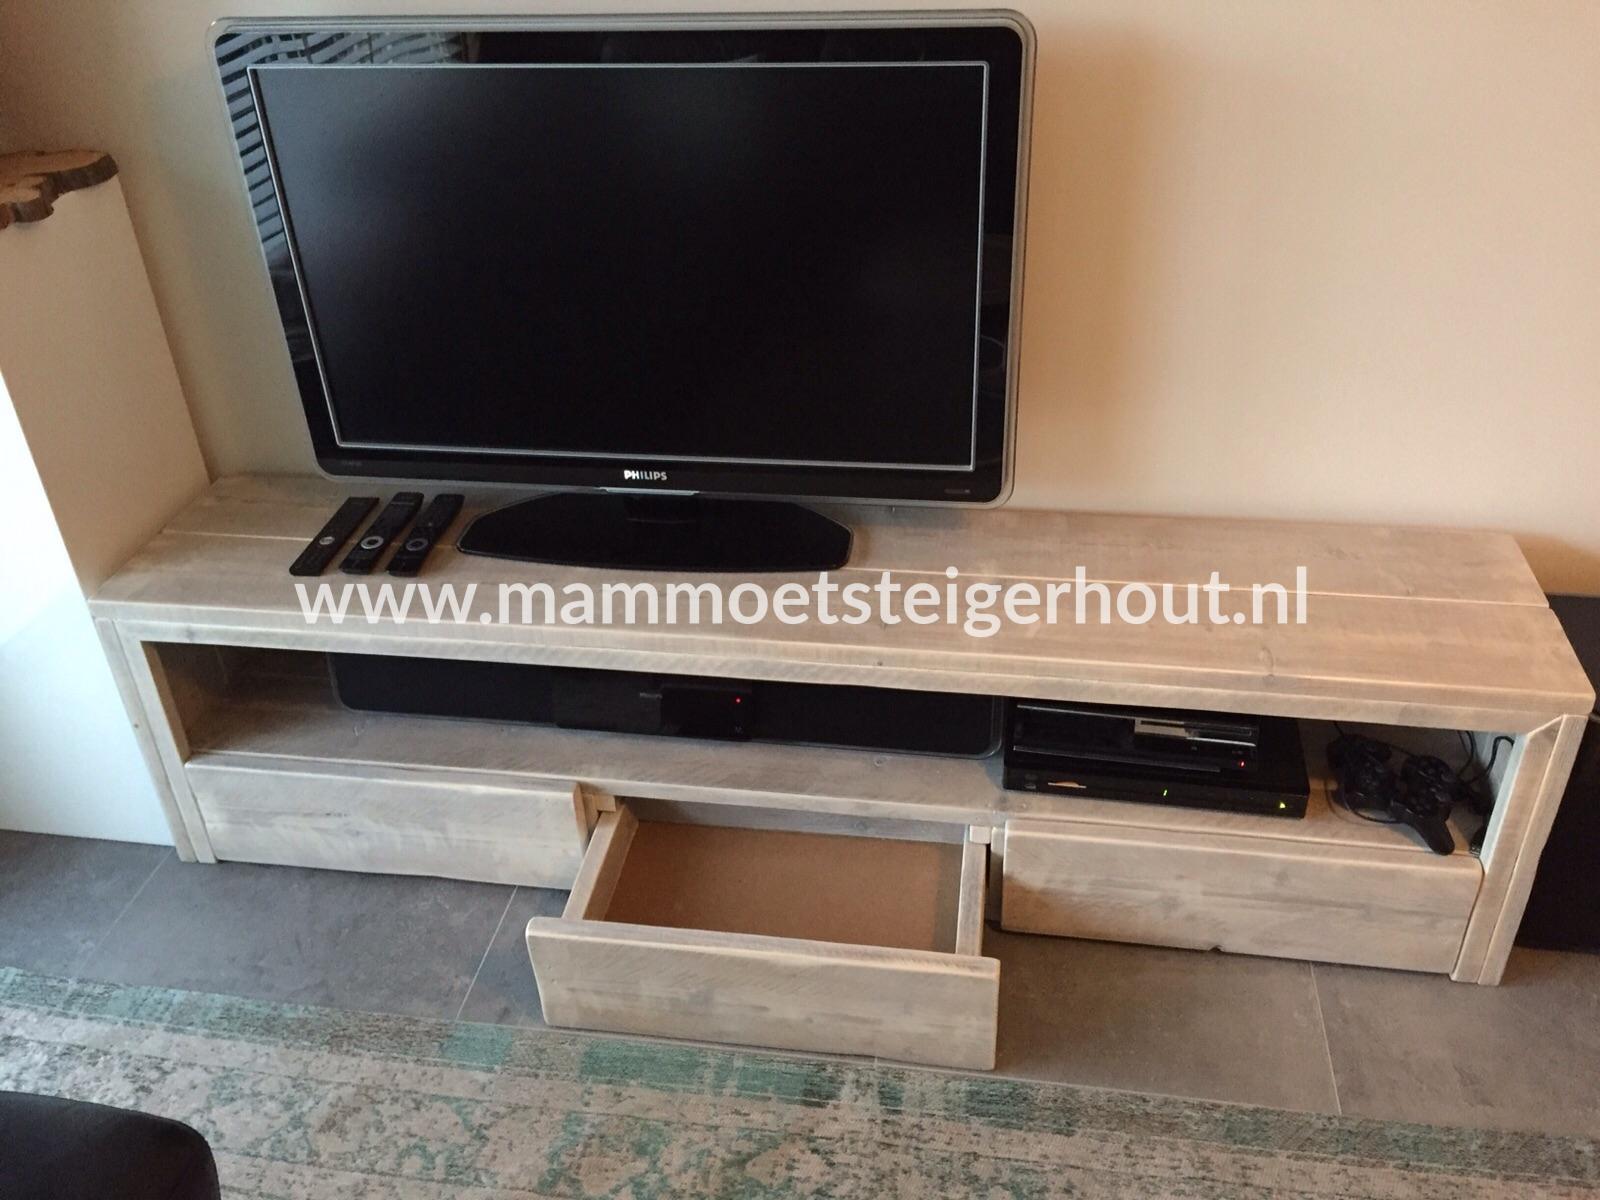 Steigerhout Tv Kast : Steigerhout tv meubel hamar mammoet steigerhouten